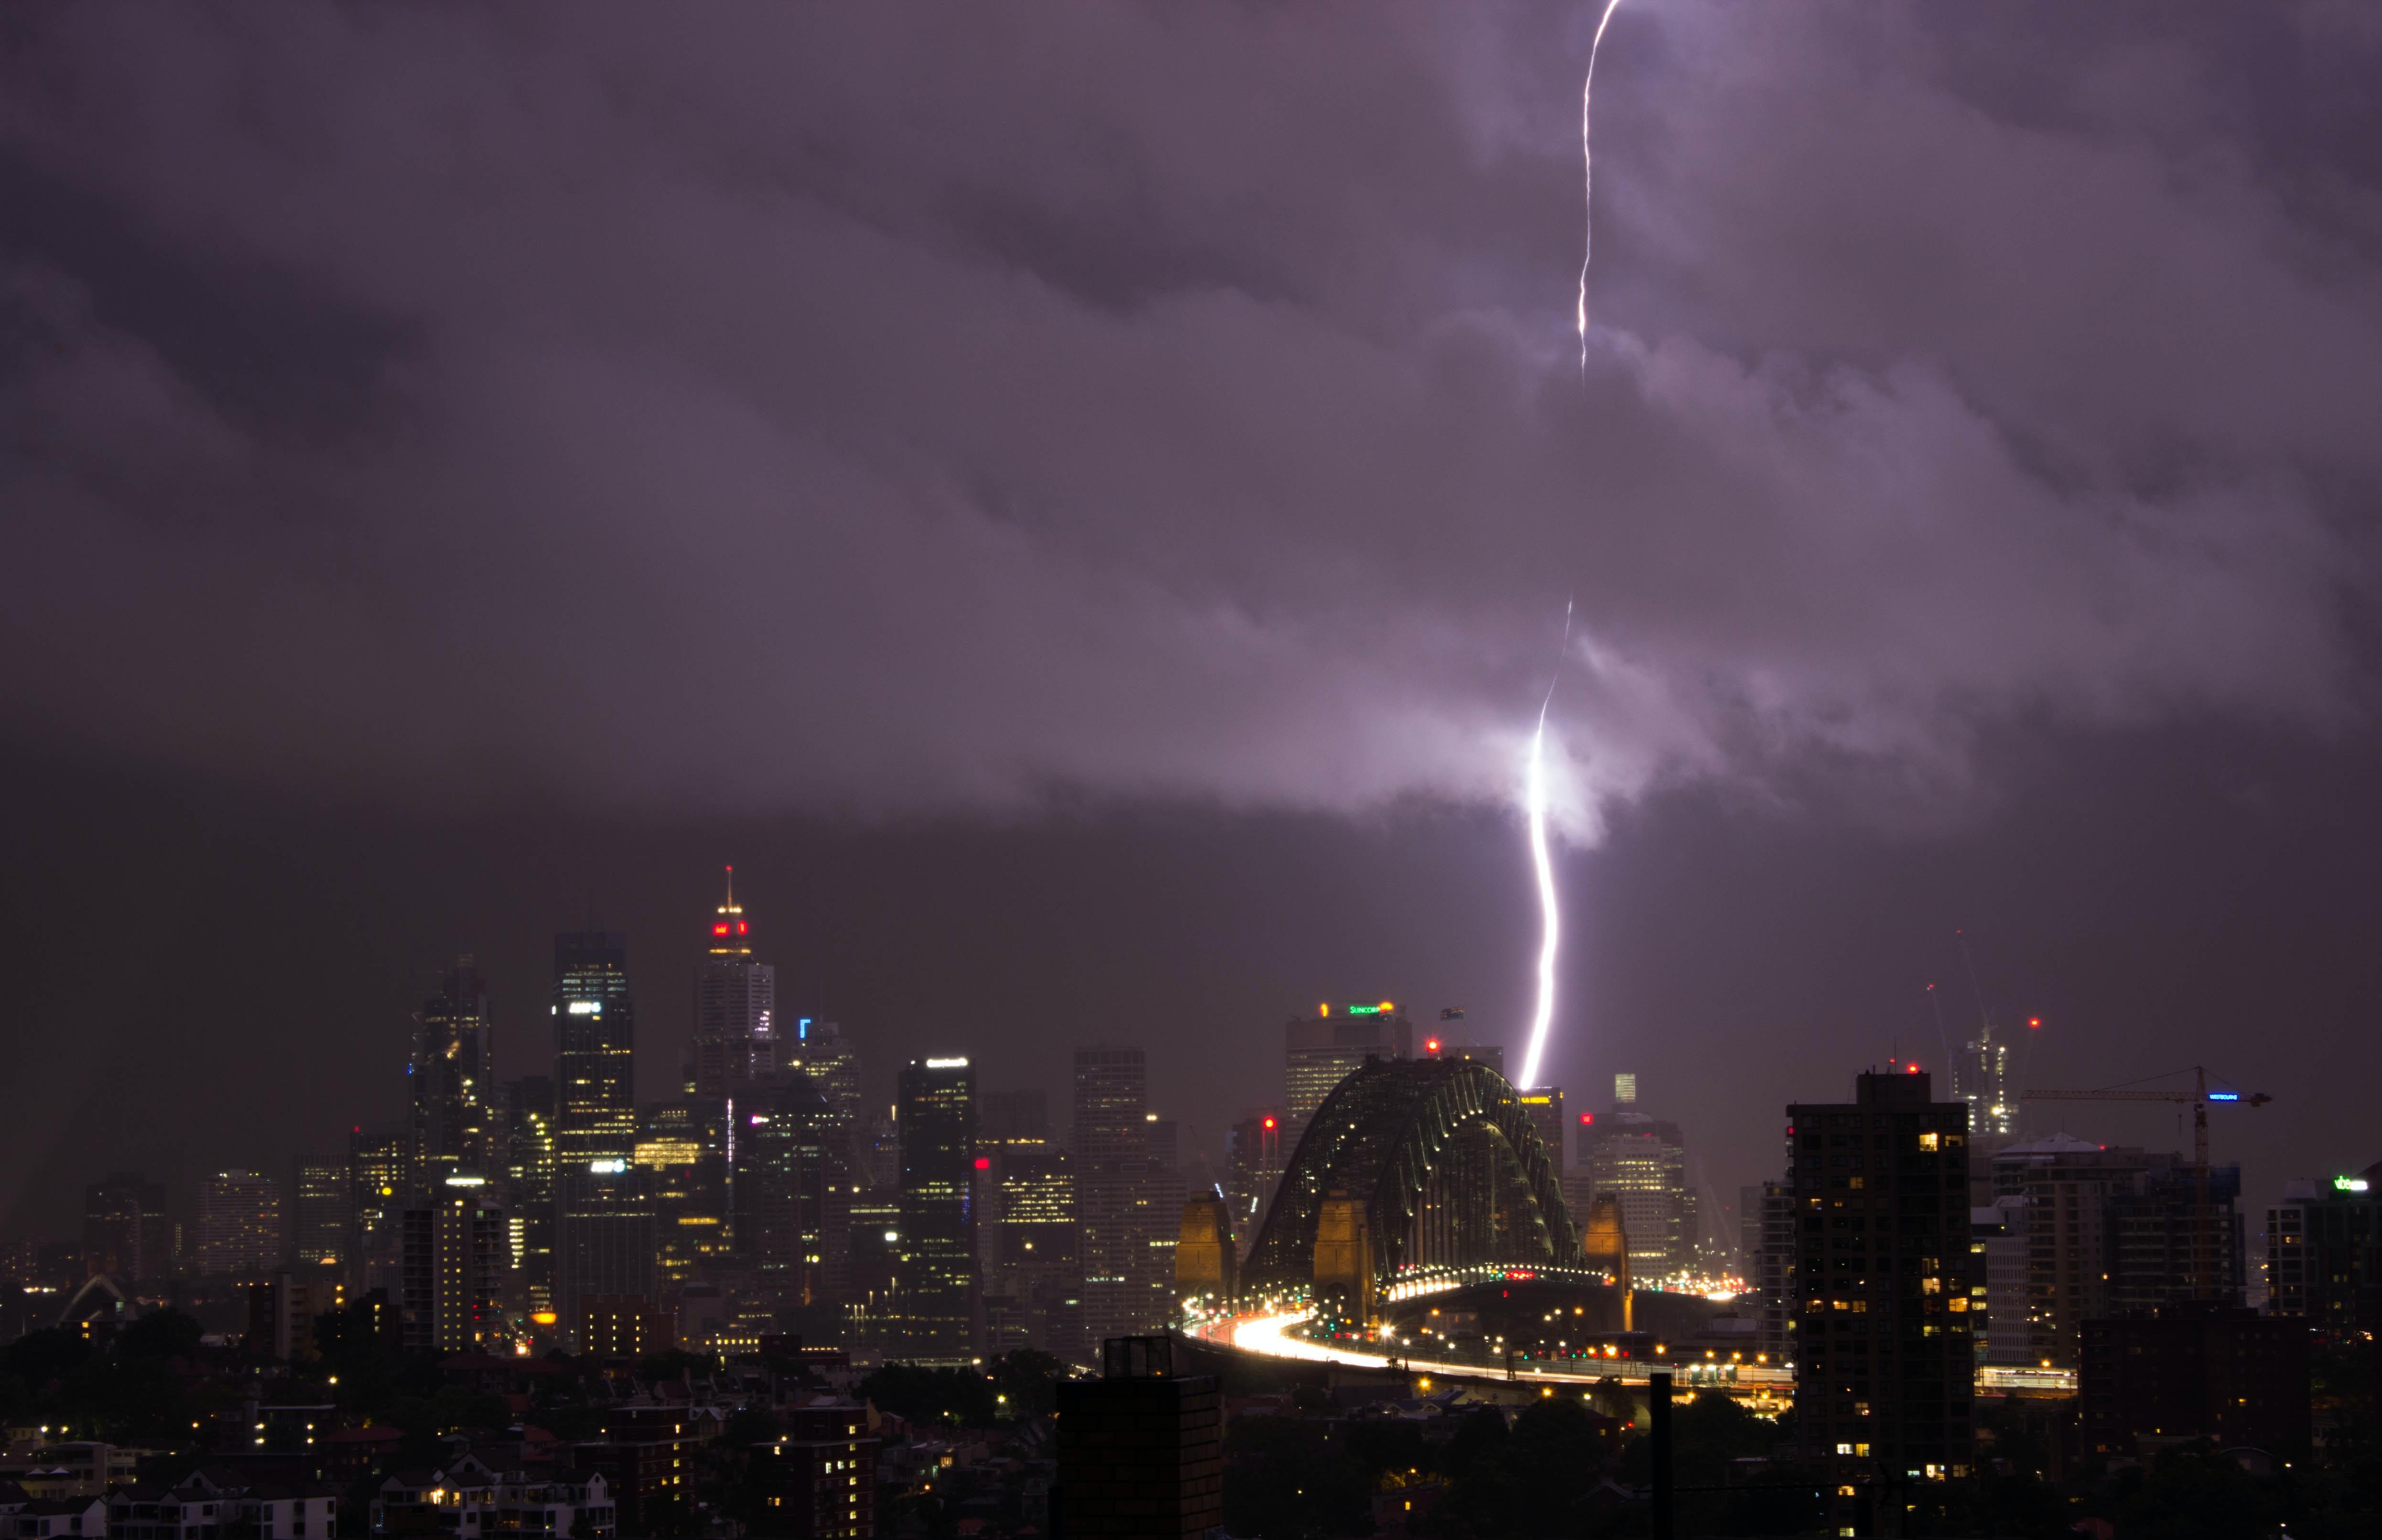 thunder on concrete buildings